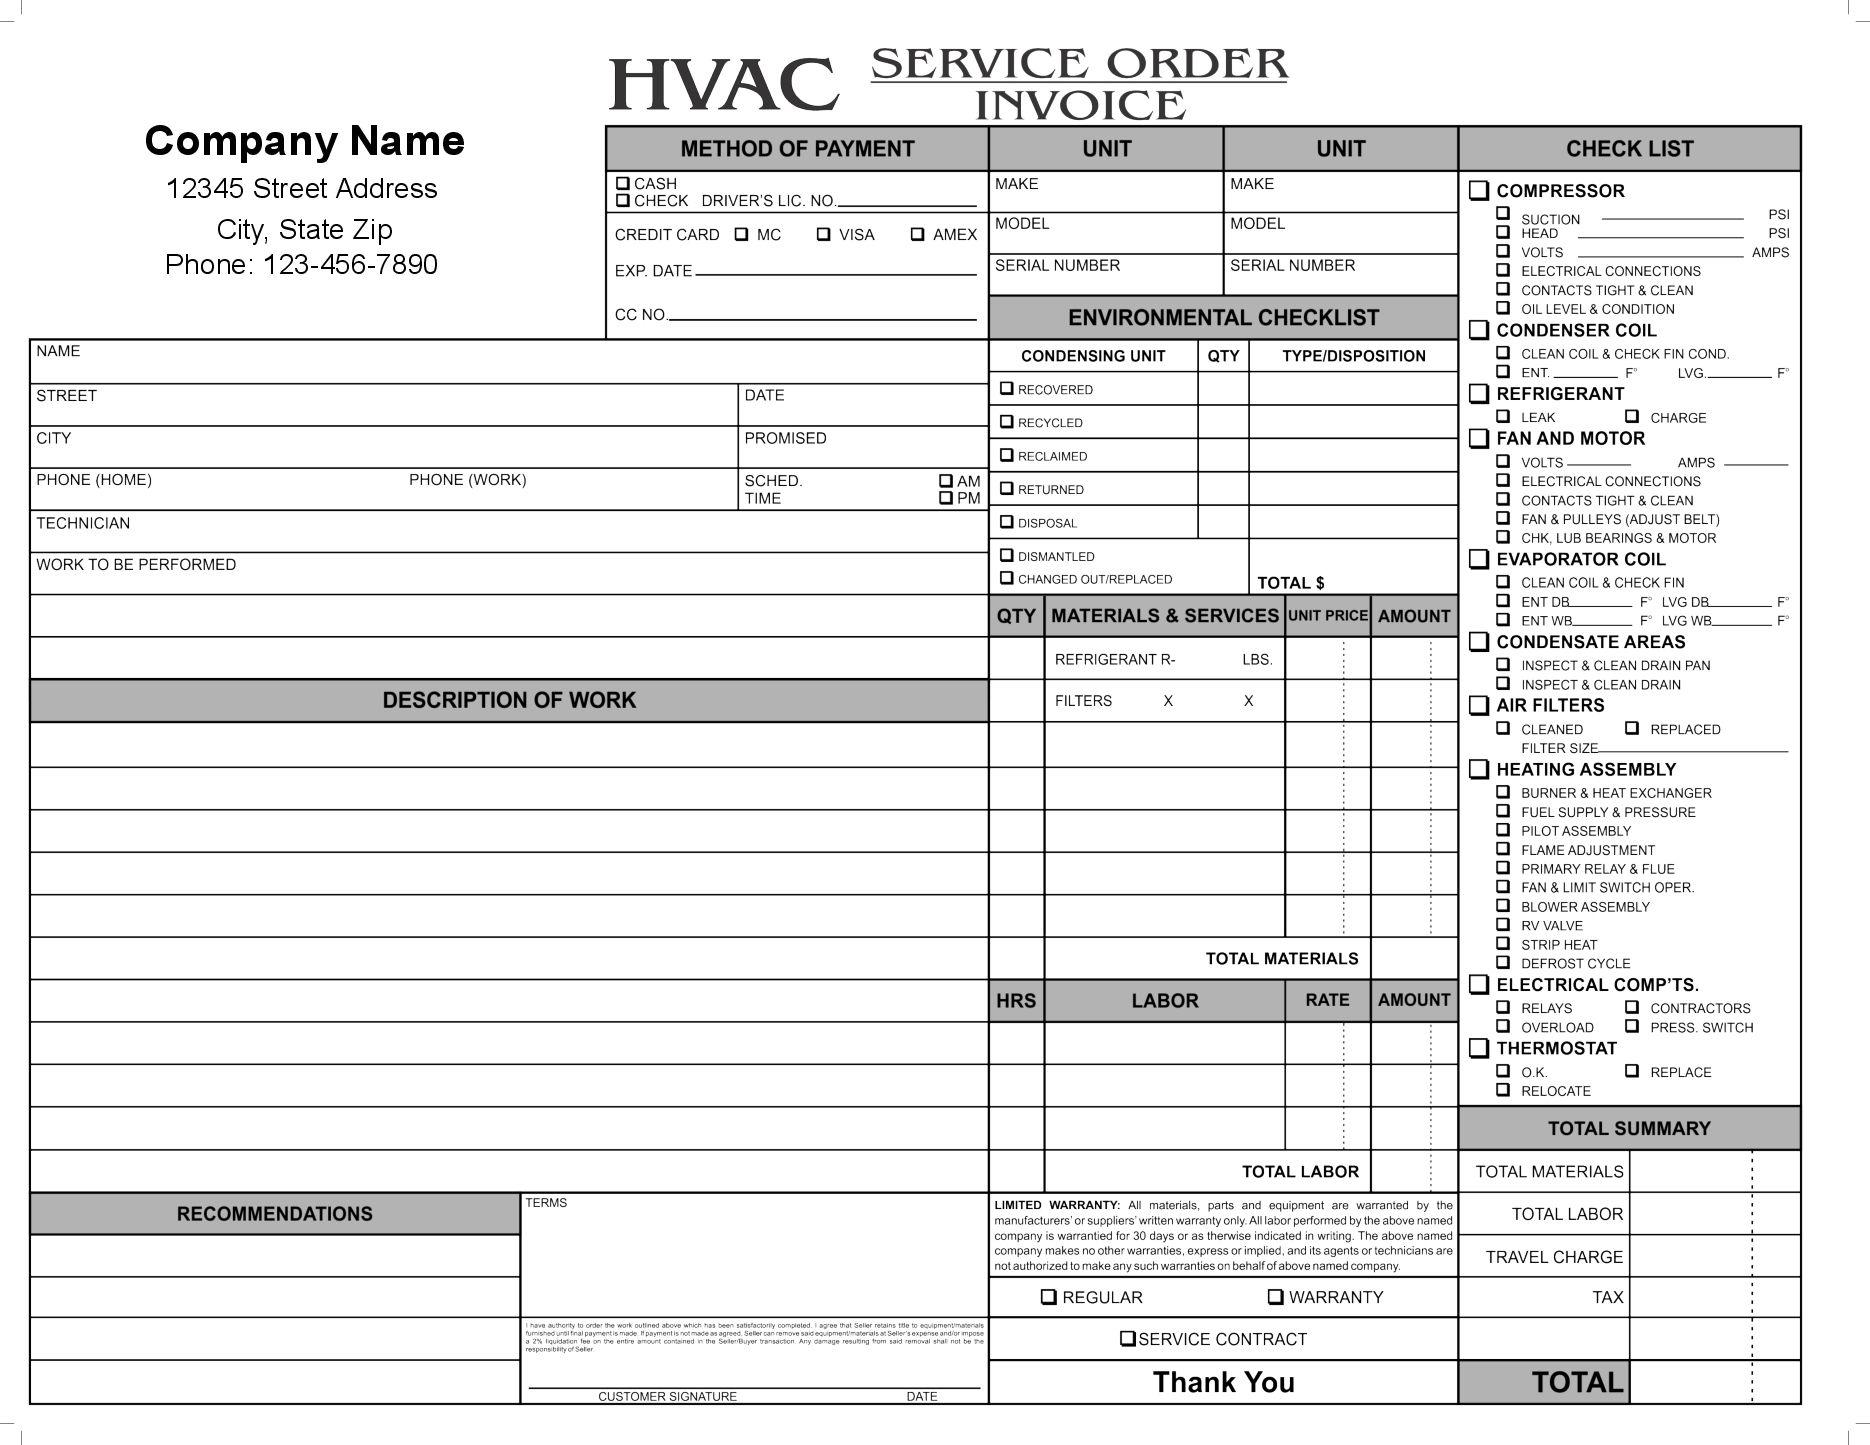 11 hvac invoice template free top invoice templates hvac invoice template [ 1870 x 1445 Pixel ]